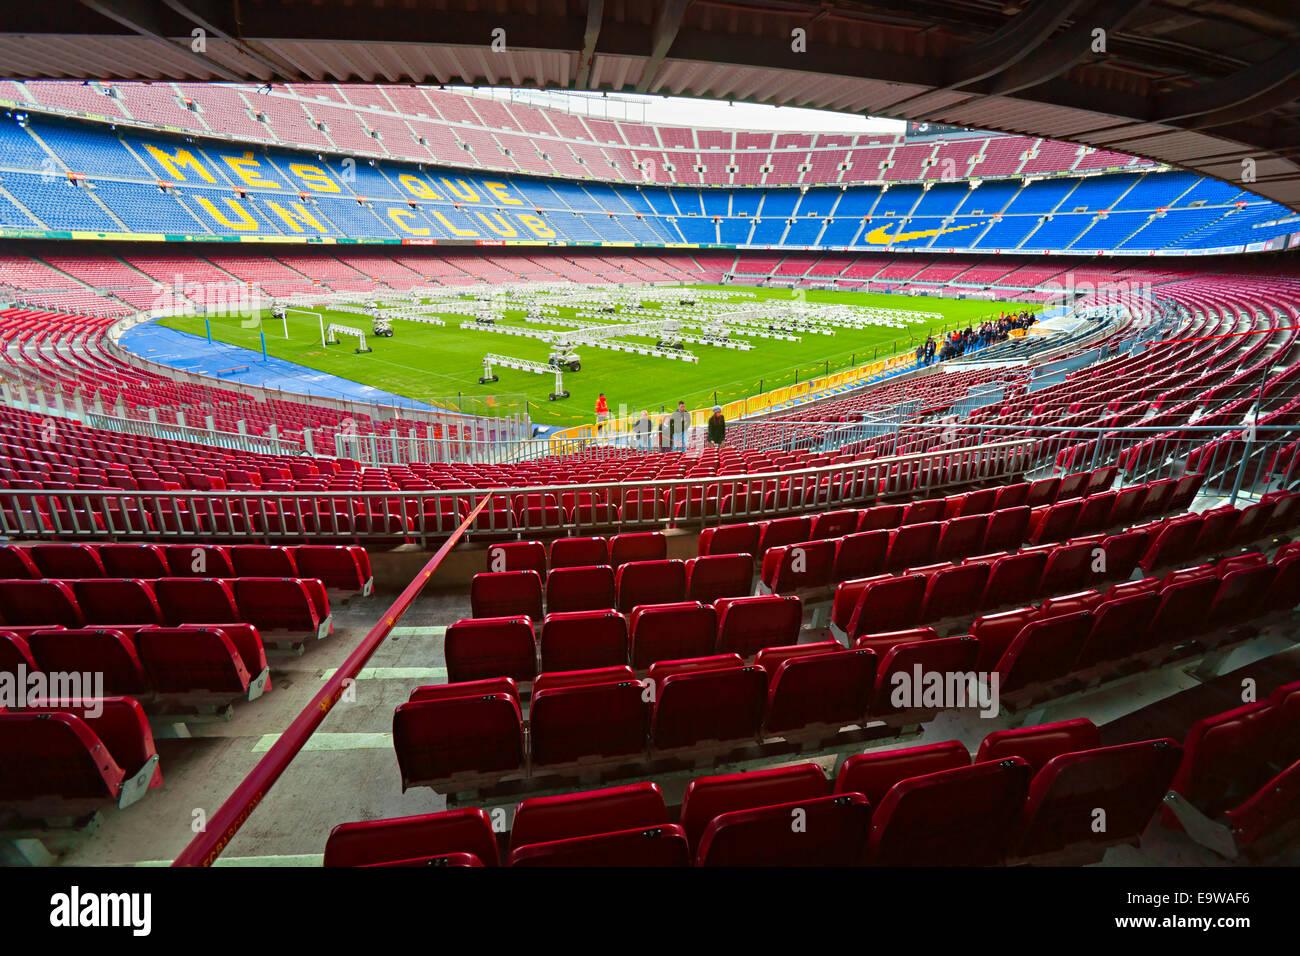 Camp Nou, Stadium of Football Club Barcelona on December 19, 2011 in Barcelona, Spain. - Stock Image